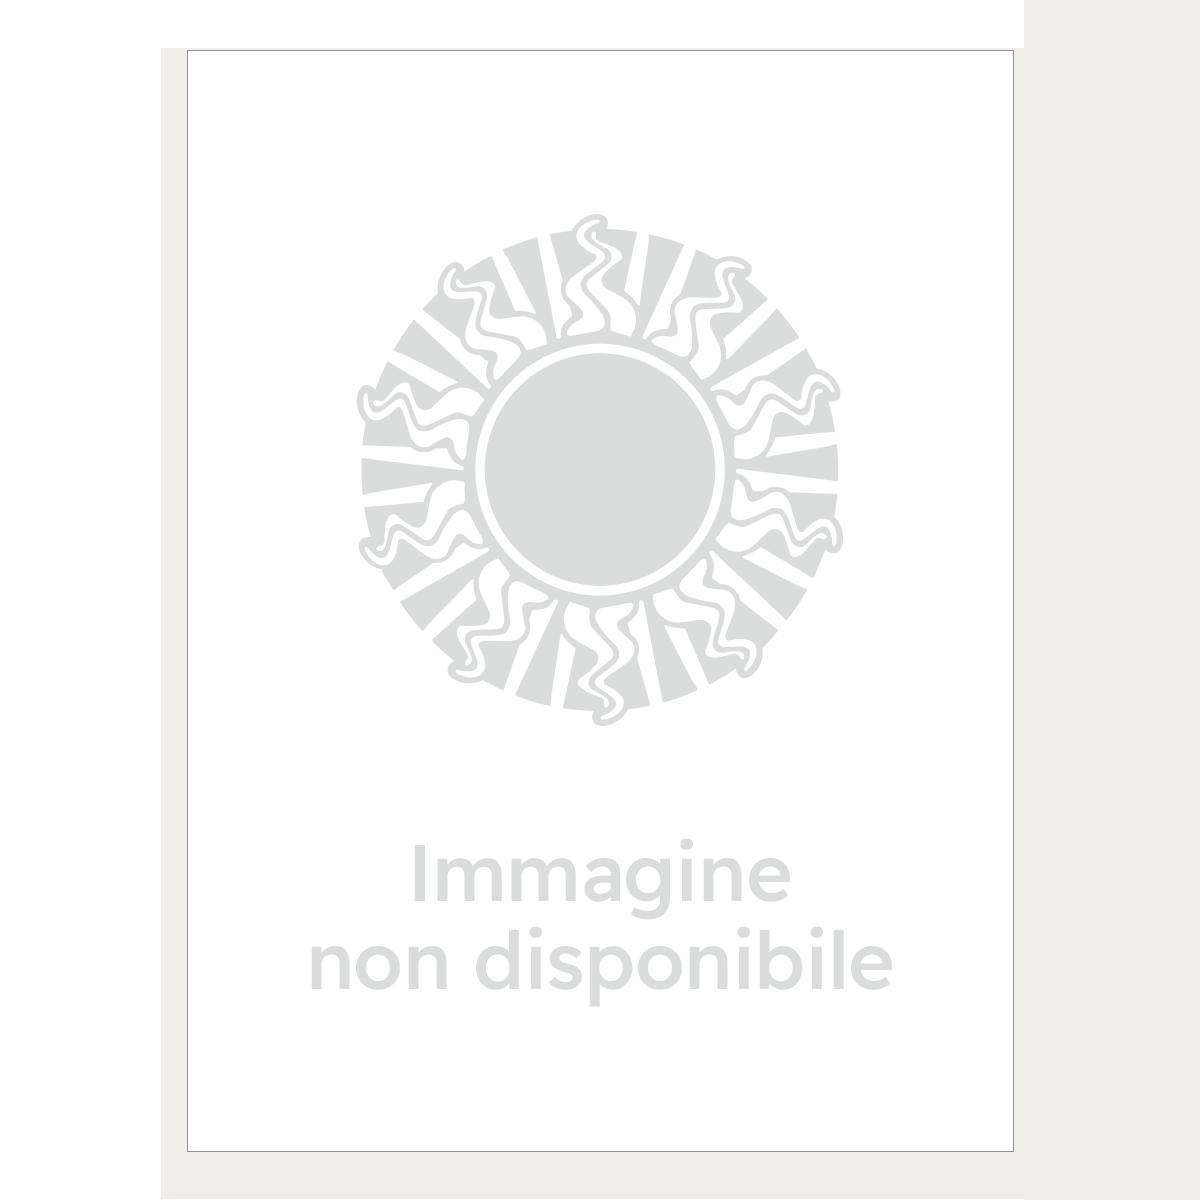 Tombe, sarcofagi e piramidi [PDF]